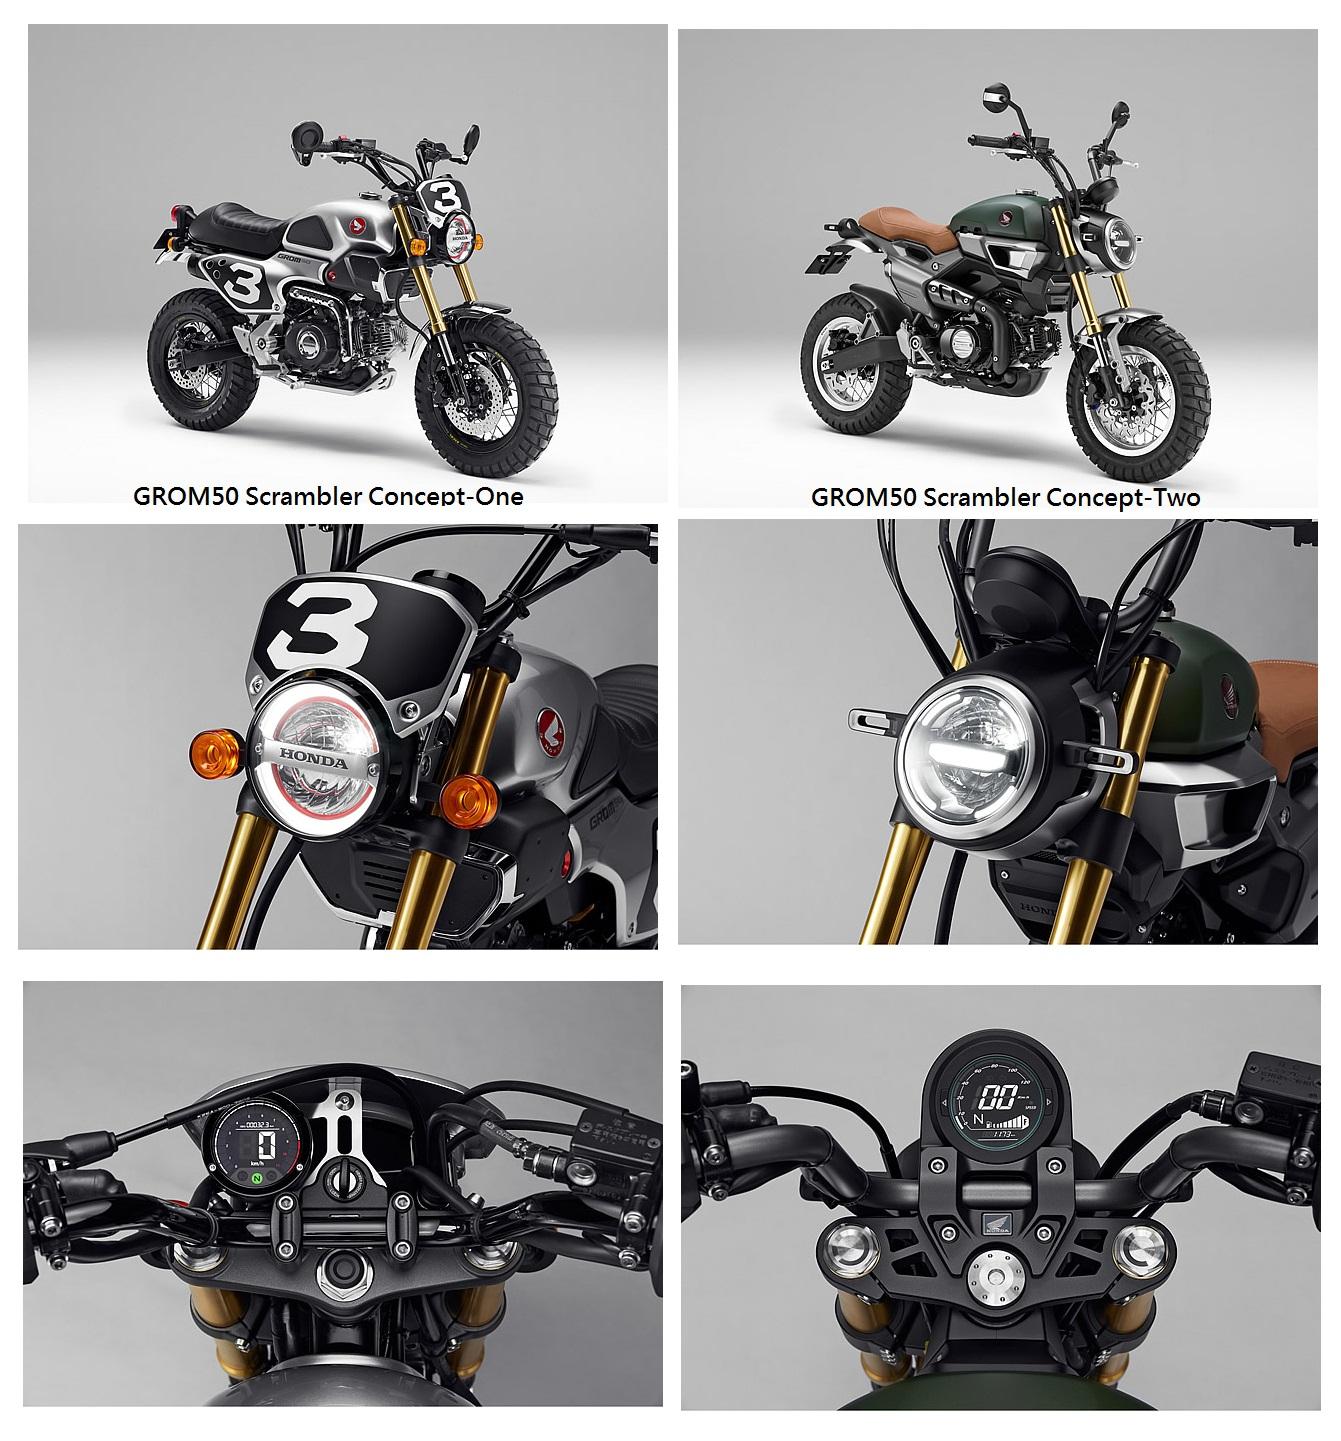 custom-2016-honda-grom-scrambler-concept-motorcycles-msx125